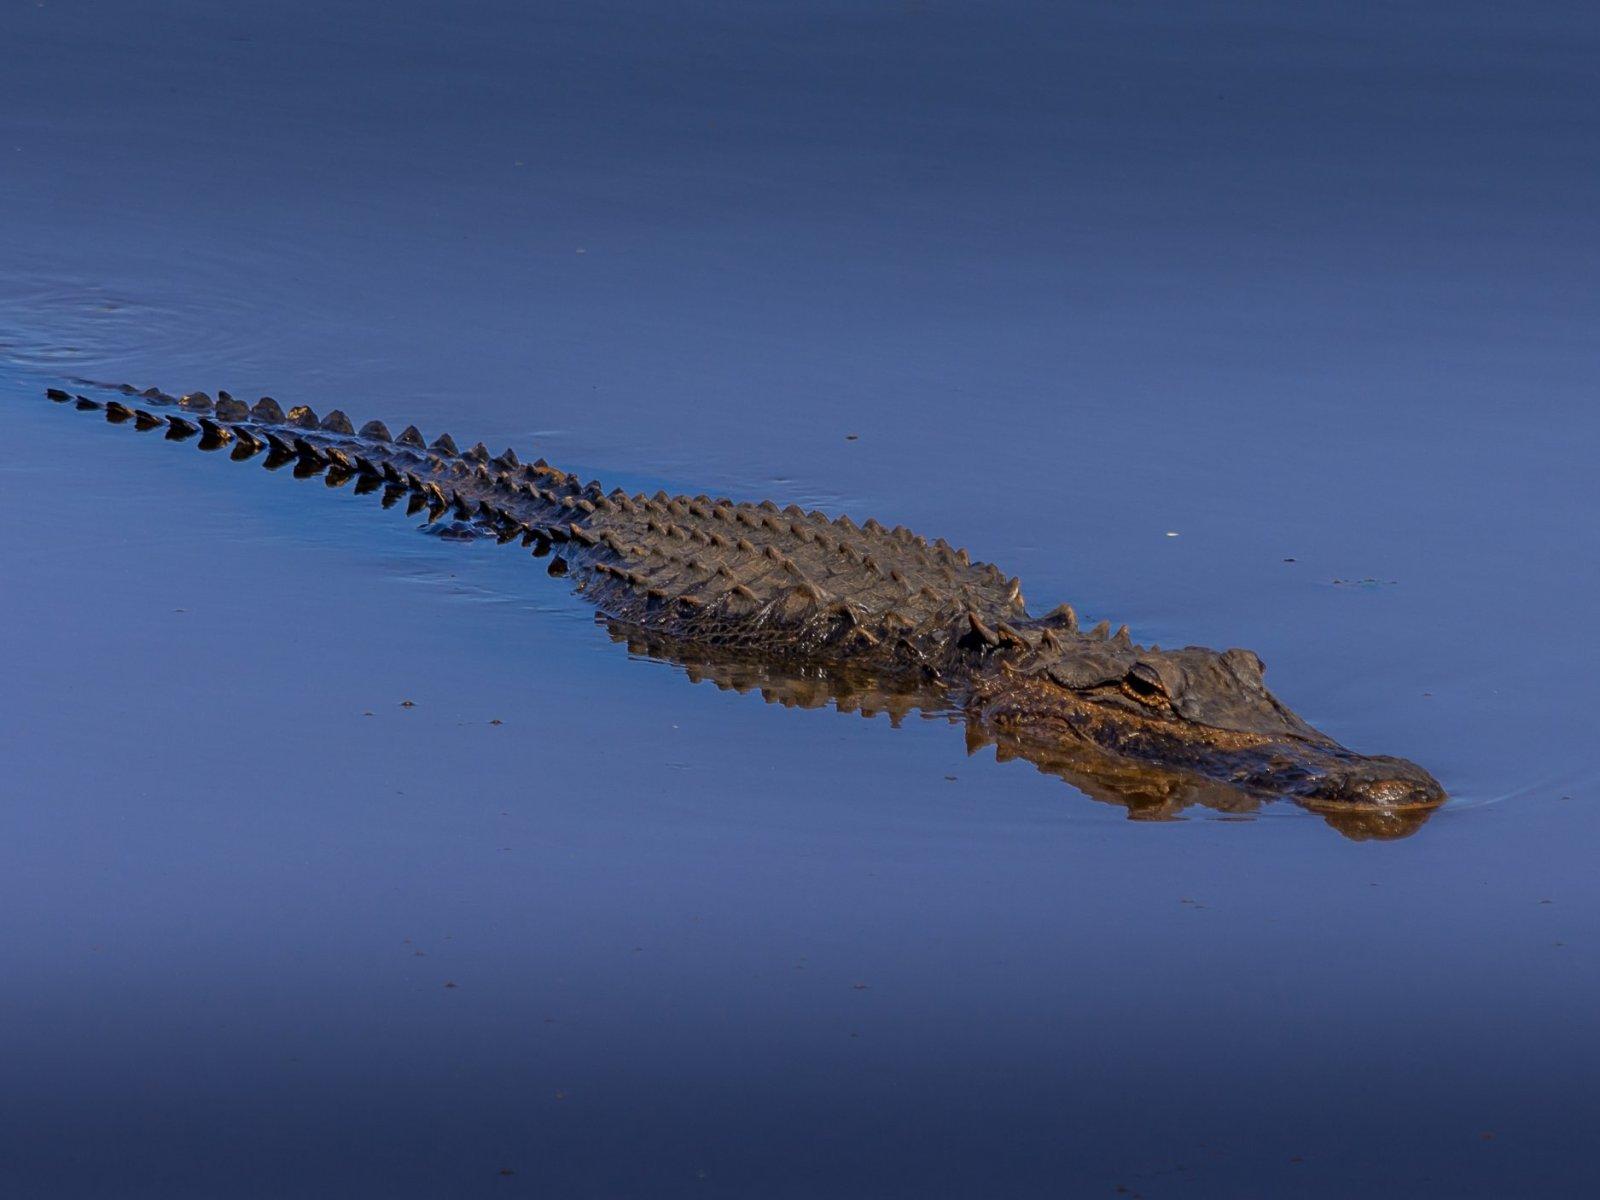 alligator attacks homeless woman in florida's citrus county lake